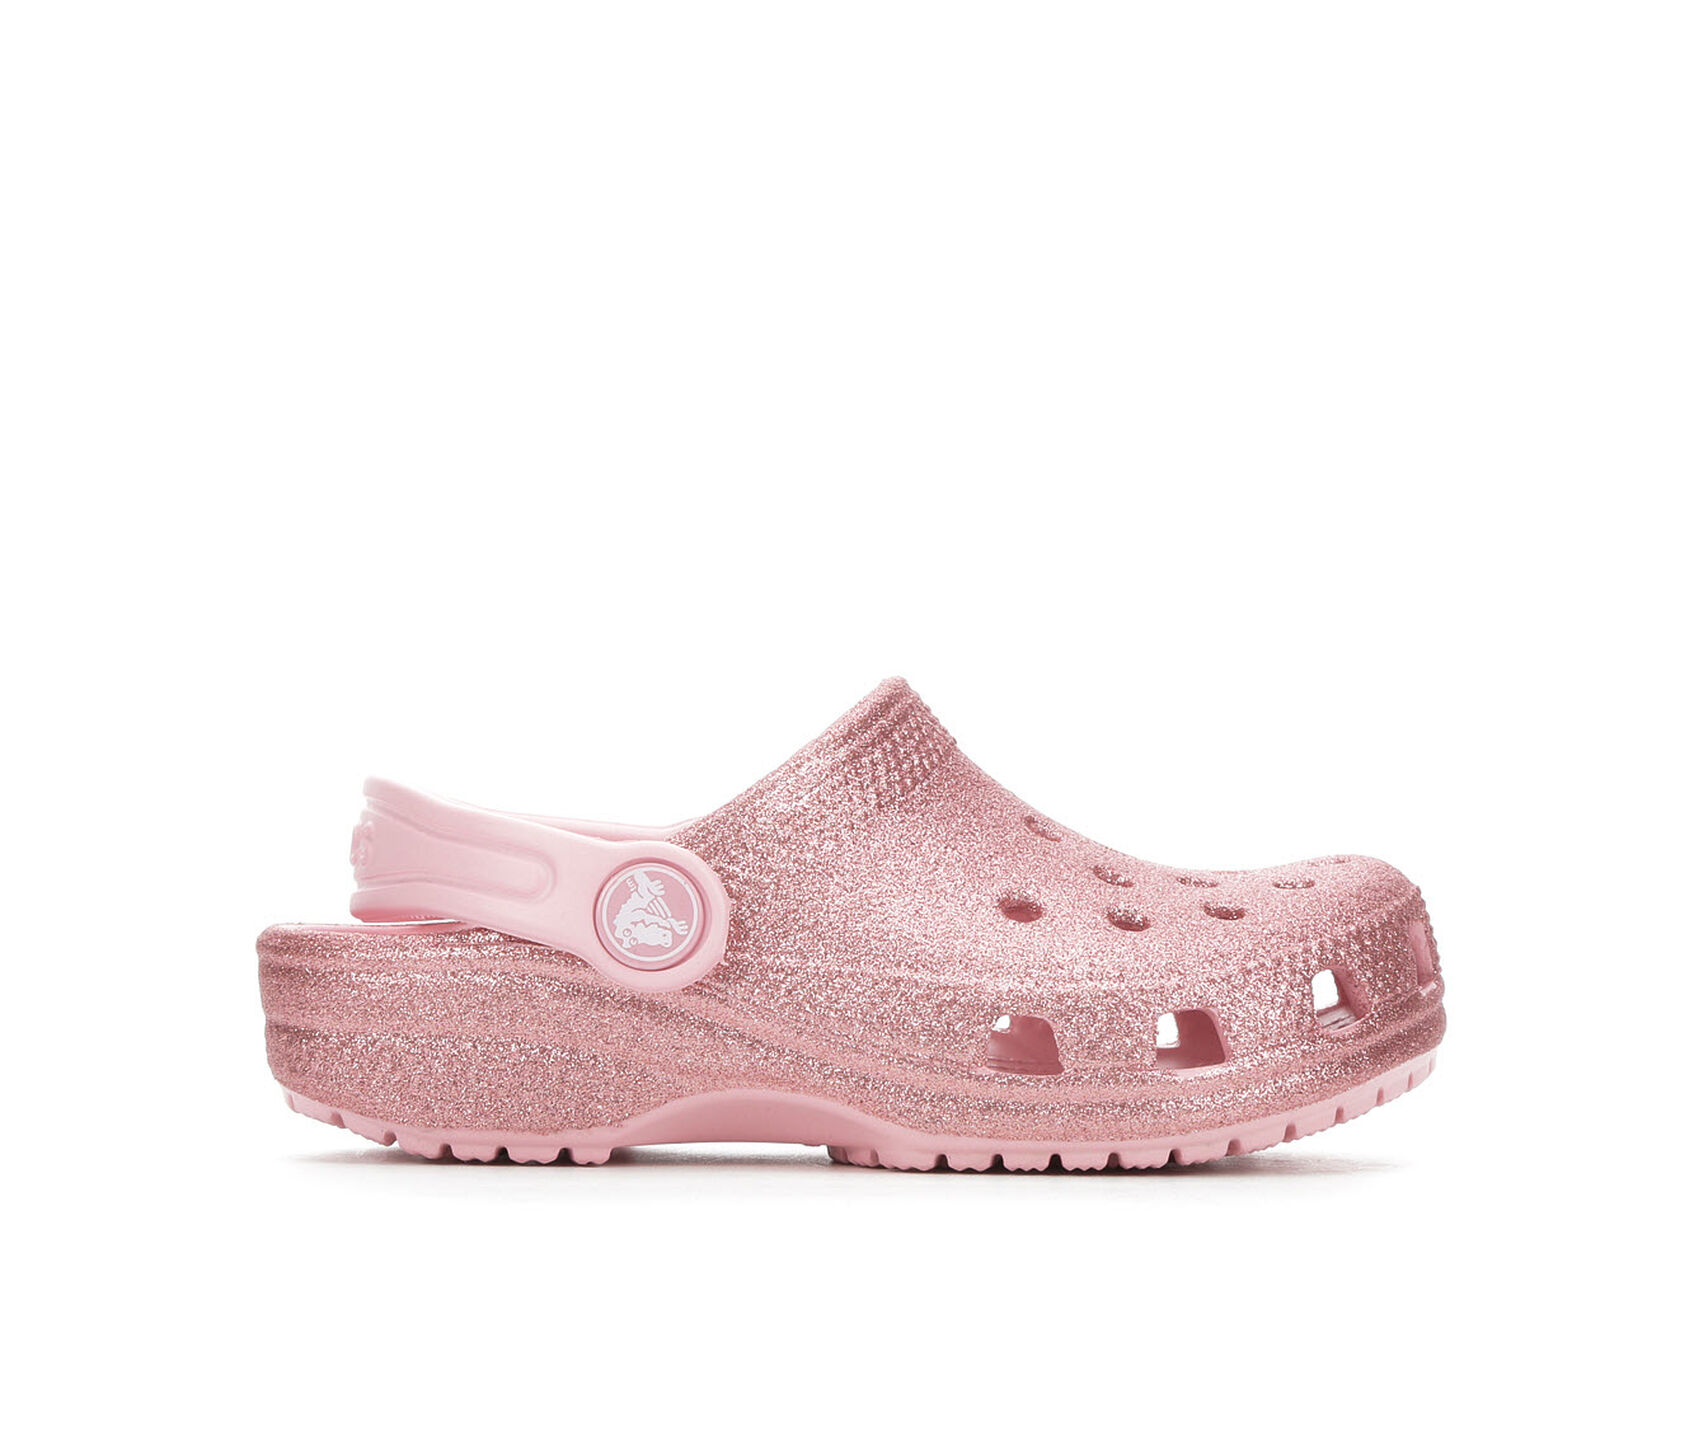 0723764cad Girls' Crocs Toddler Classic Glitter Clog | Shoe Carnival